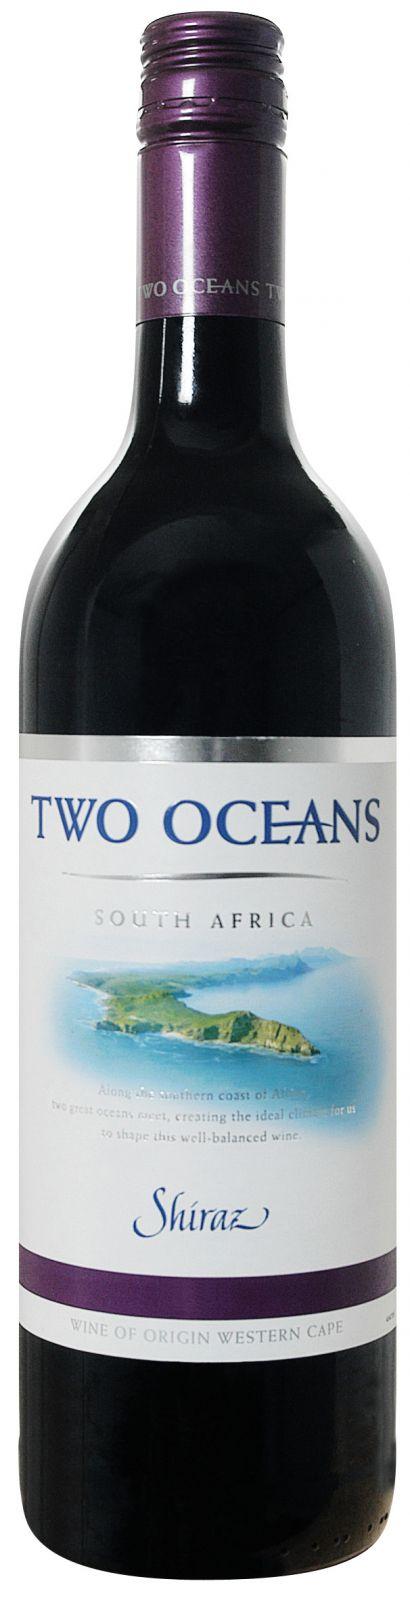 Two Oceans - Shiraz - WO Western Cape